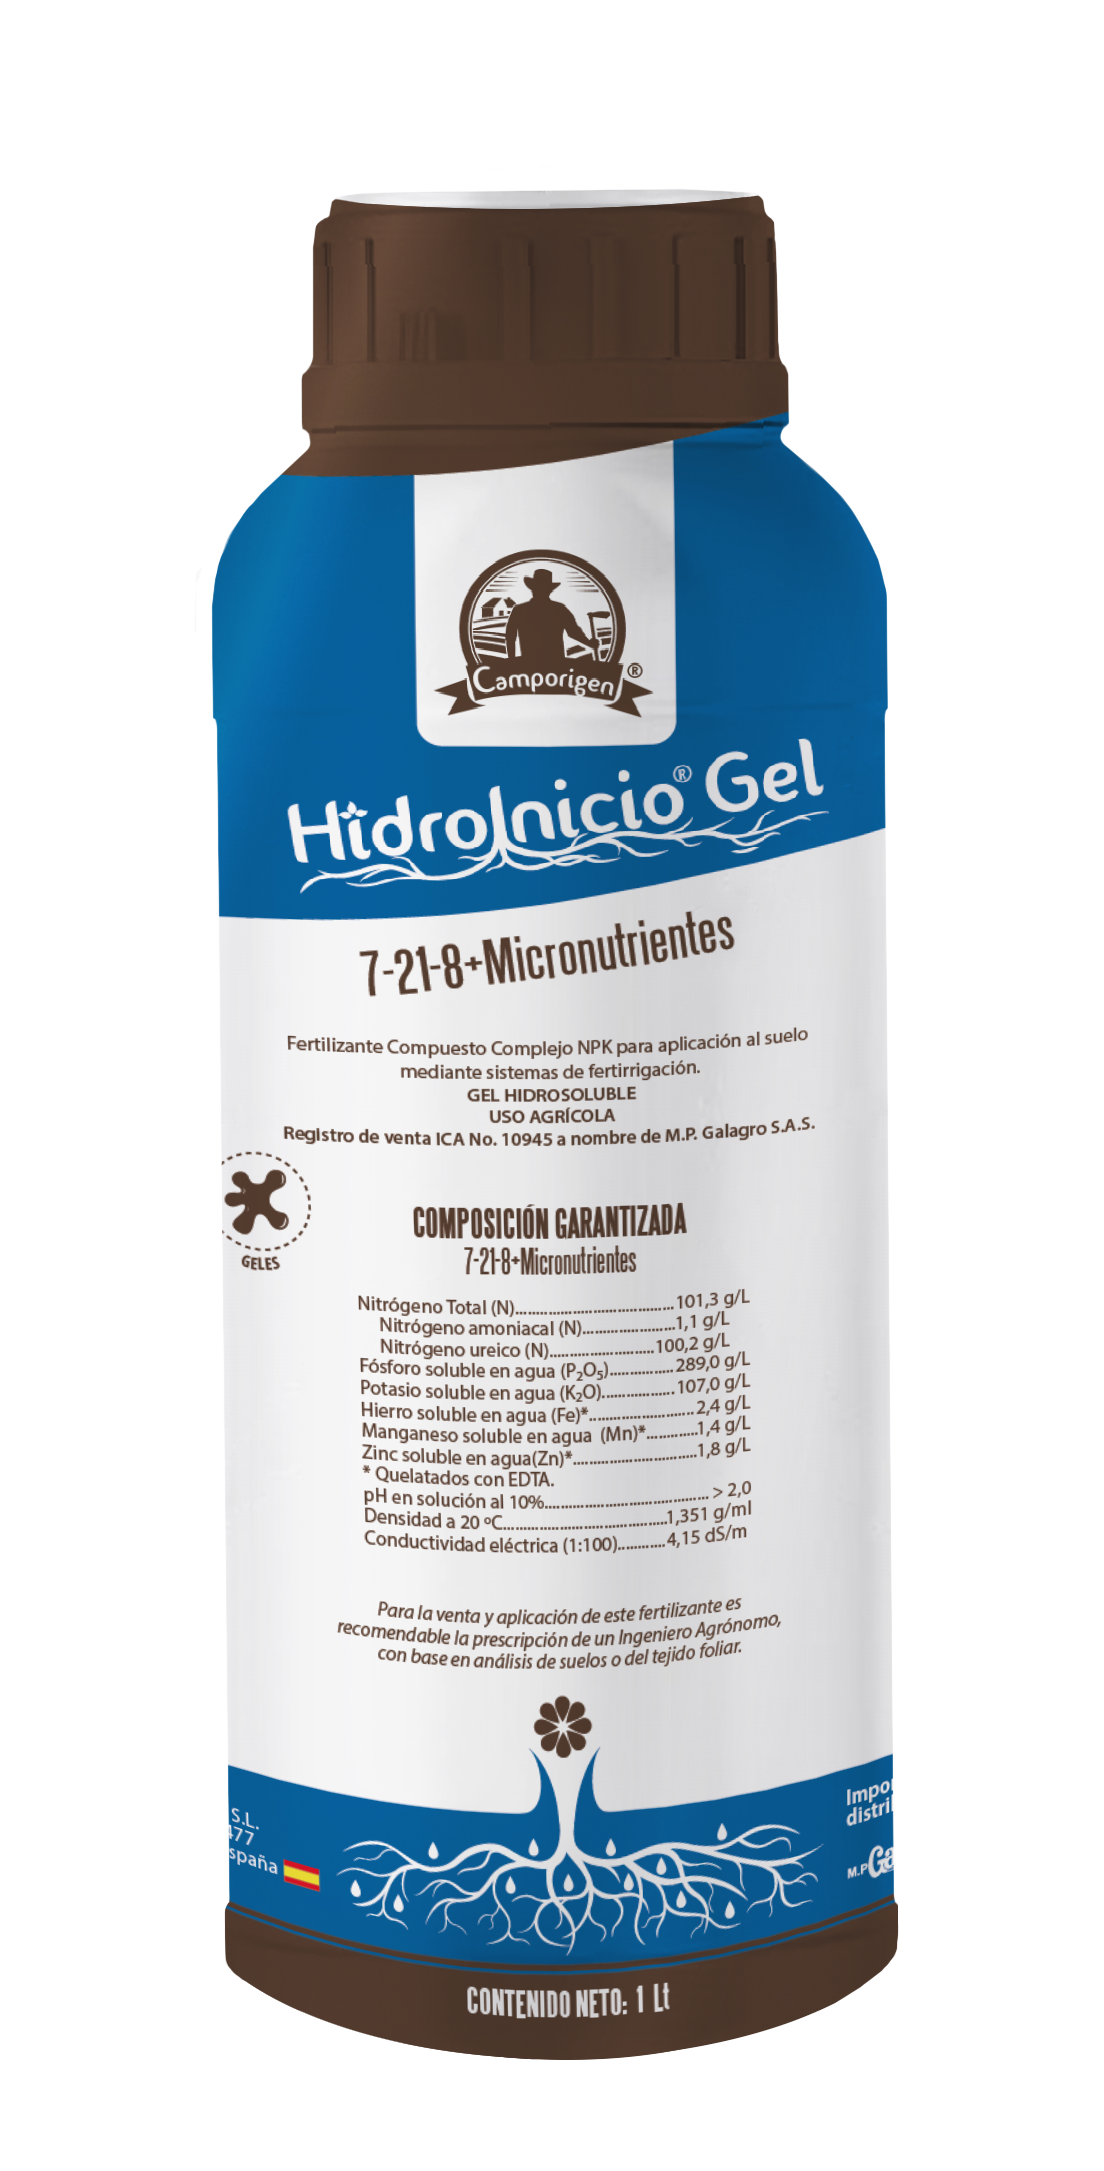 HidroInicio-gel-1-lt.png